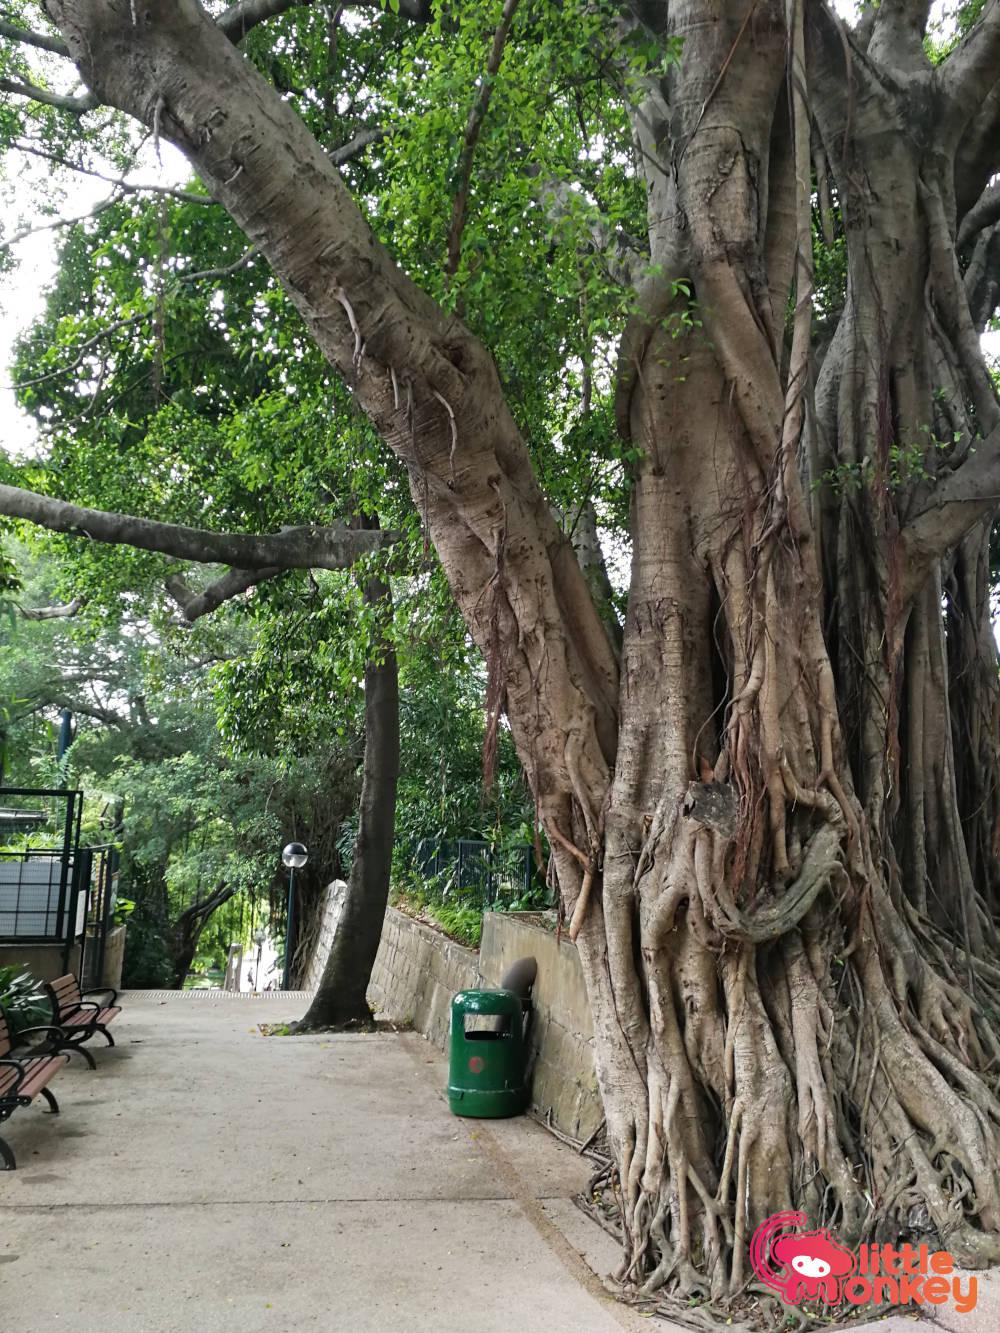 Kowloon Park's banyan trees